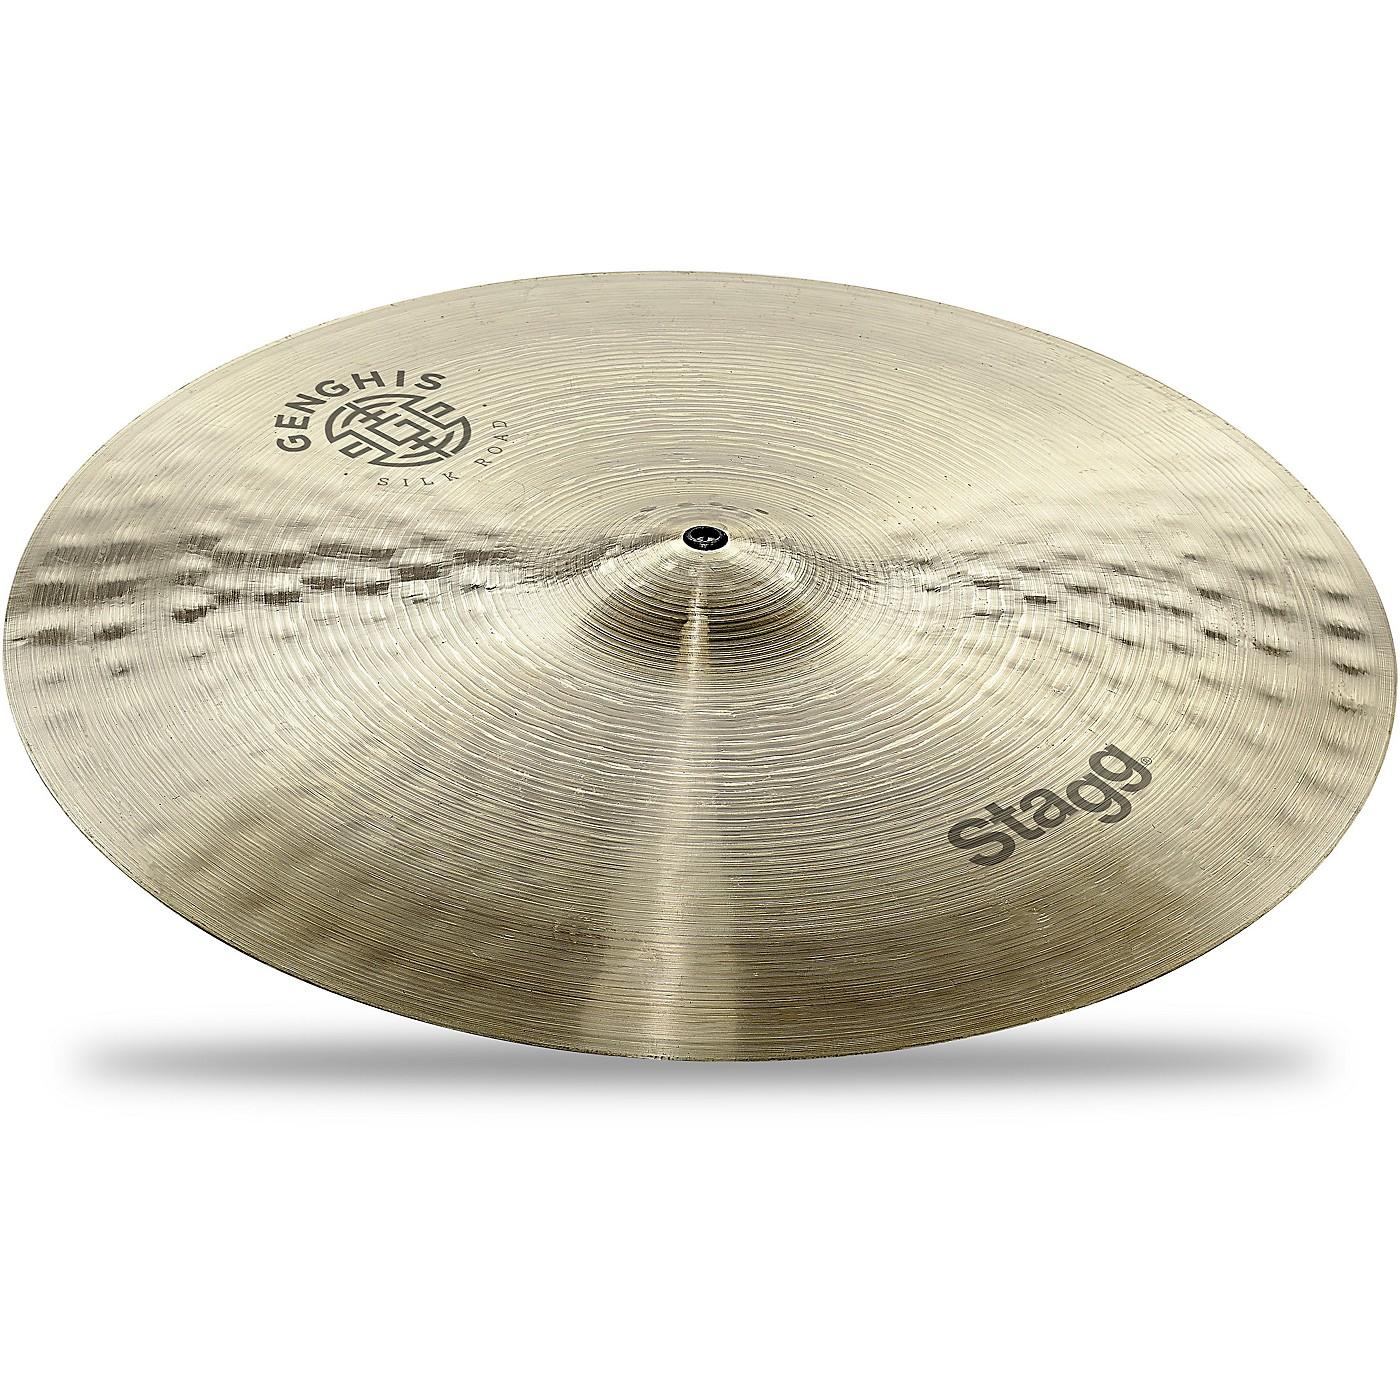 Stagg Genghis Series Medium Crash Cymbal thumbnail